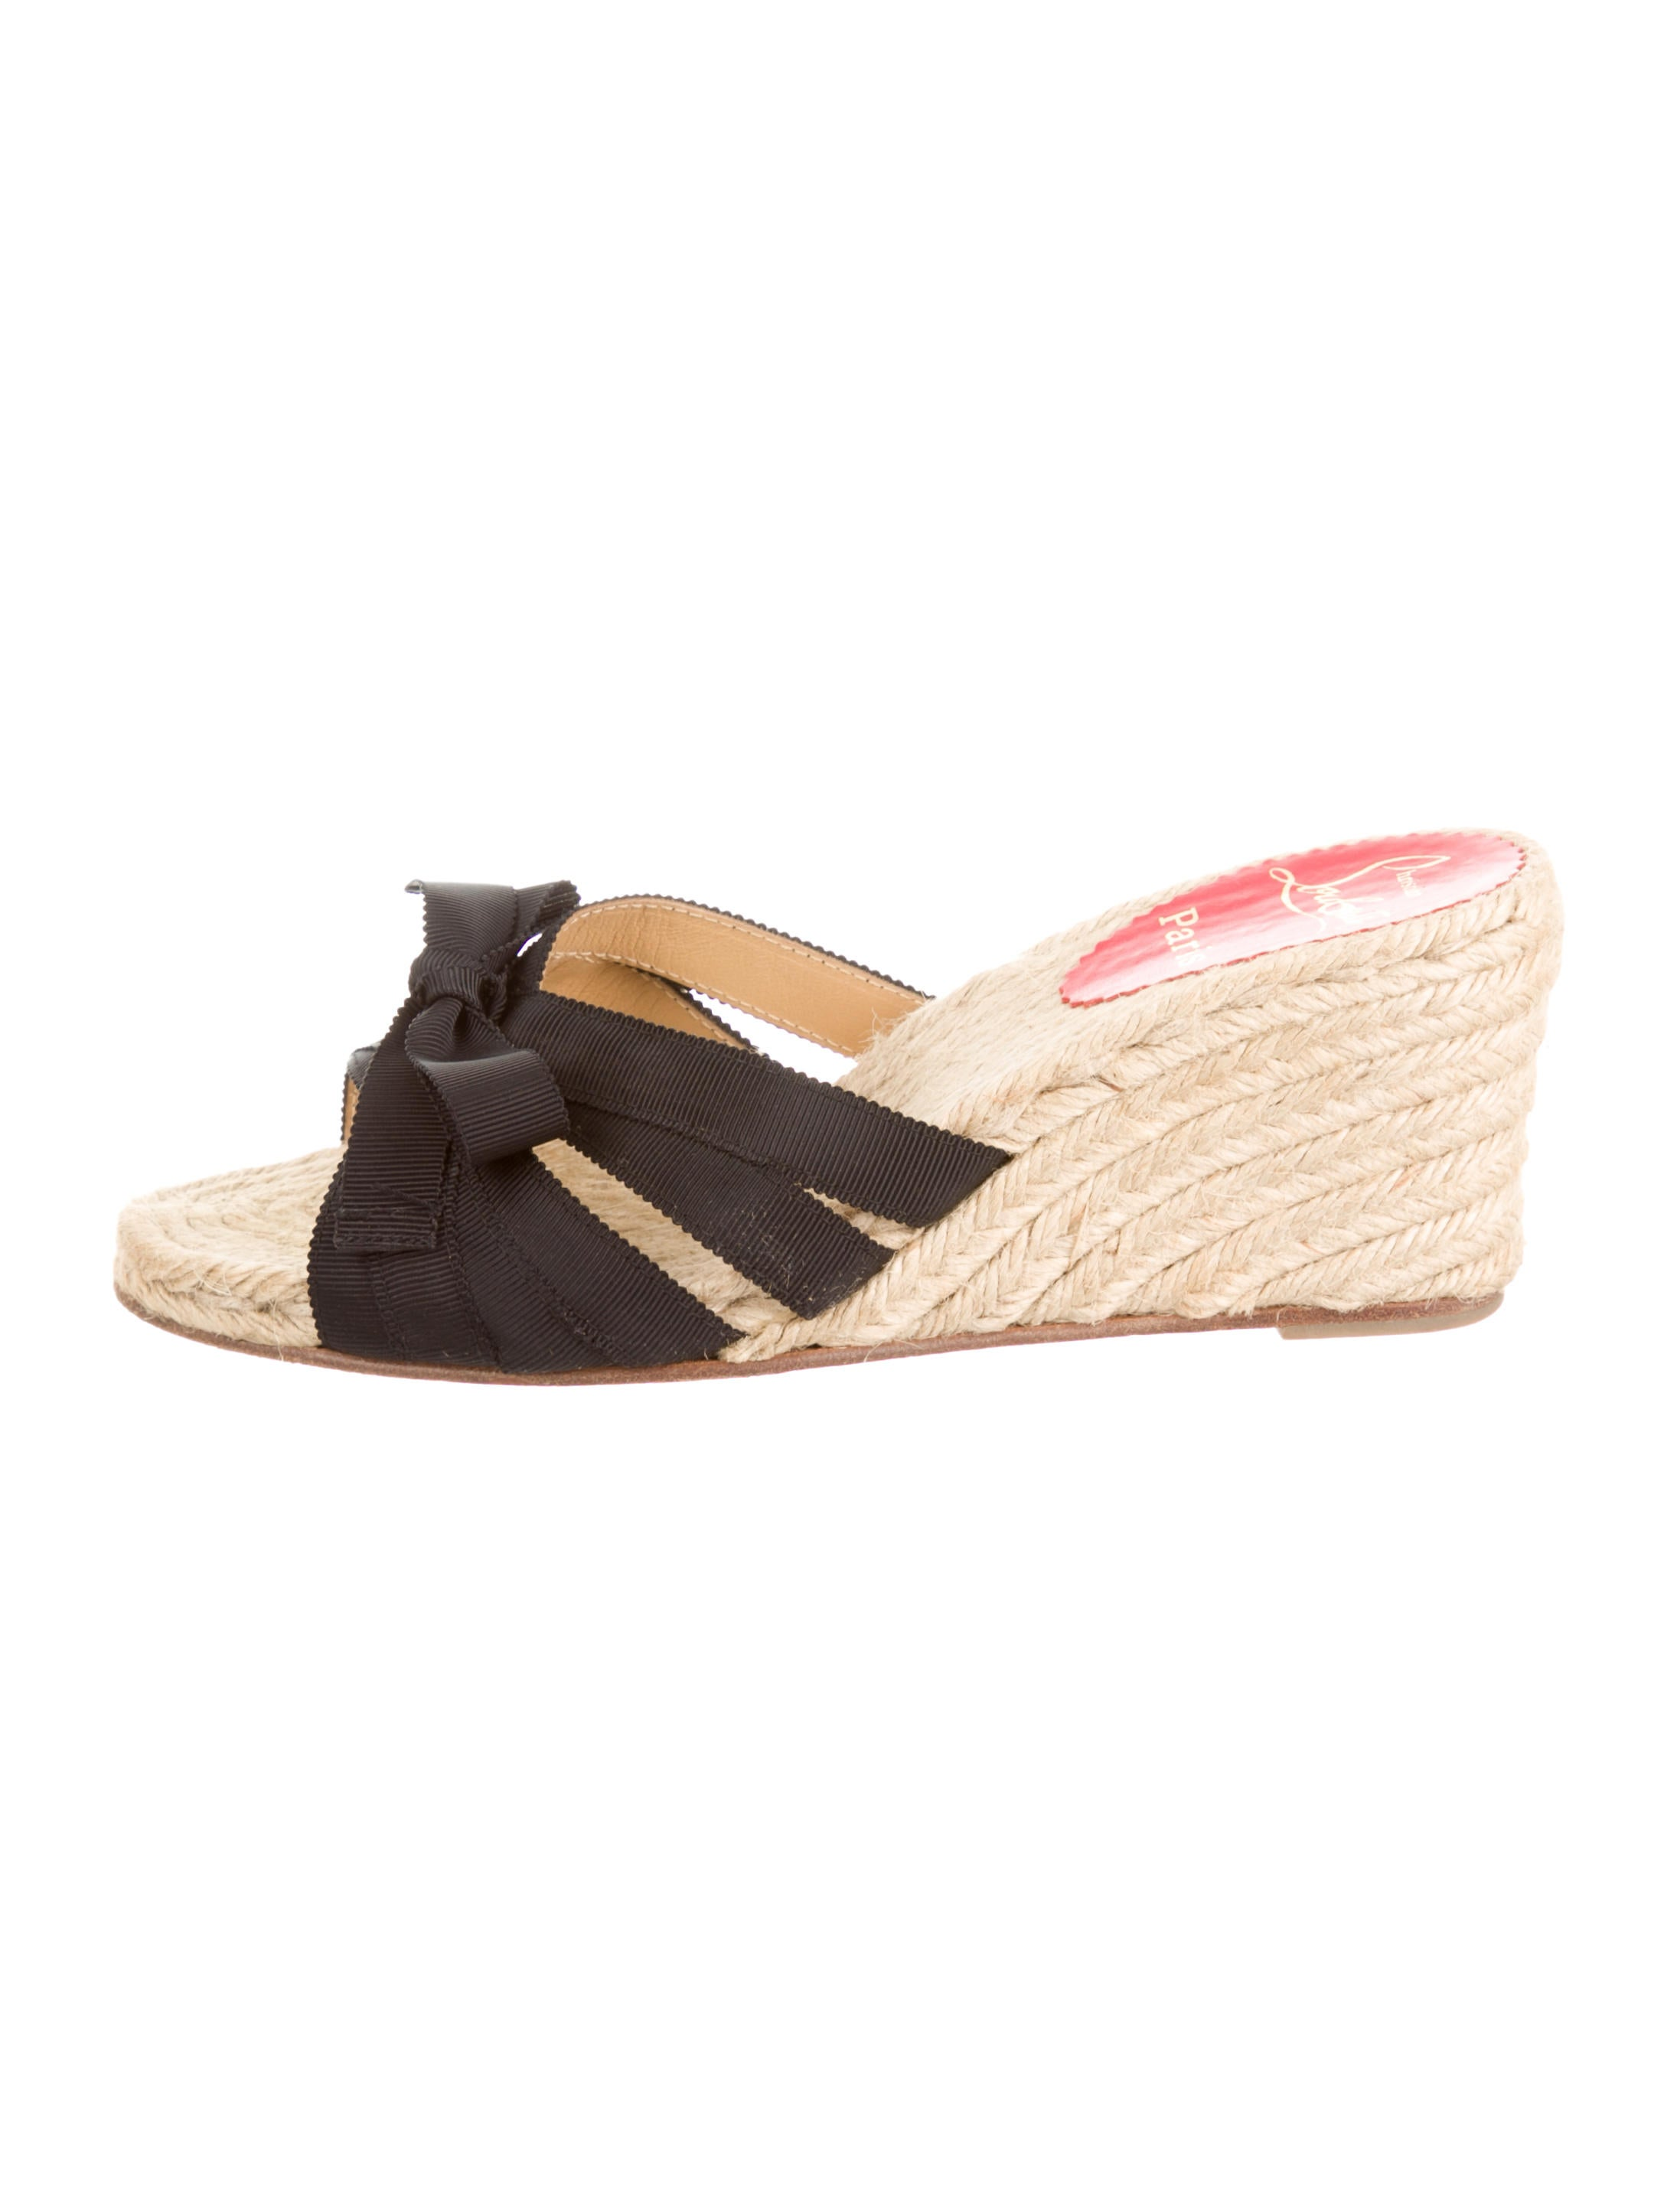 Christian Louboutin Espadrille Slide Sandals - Shoes - CHT43141 ...